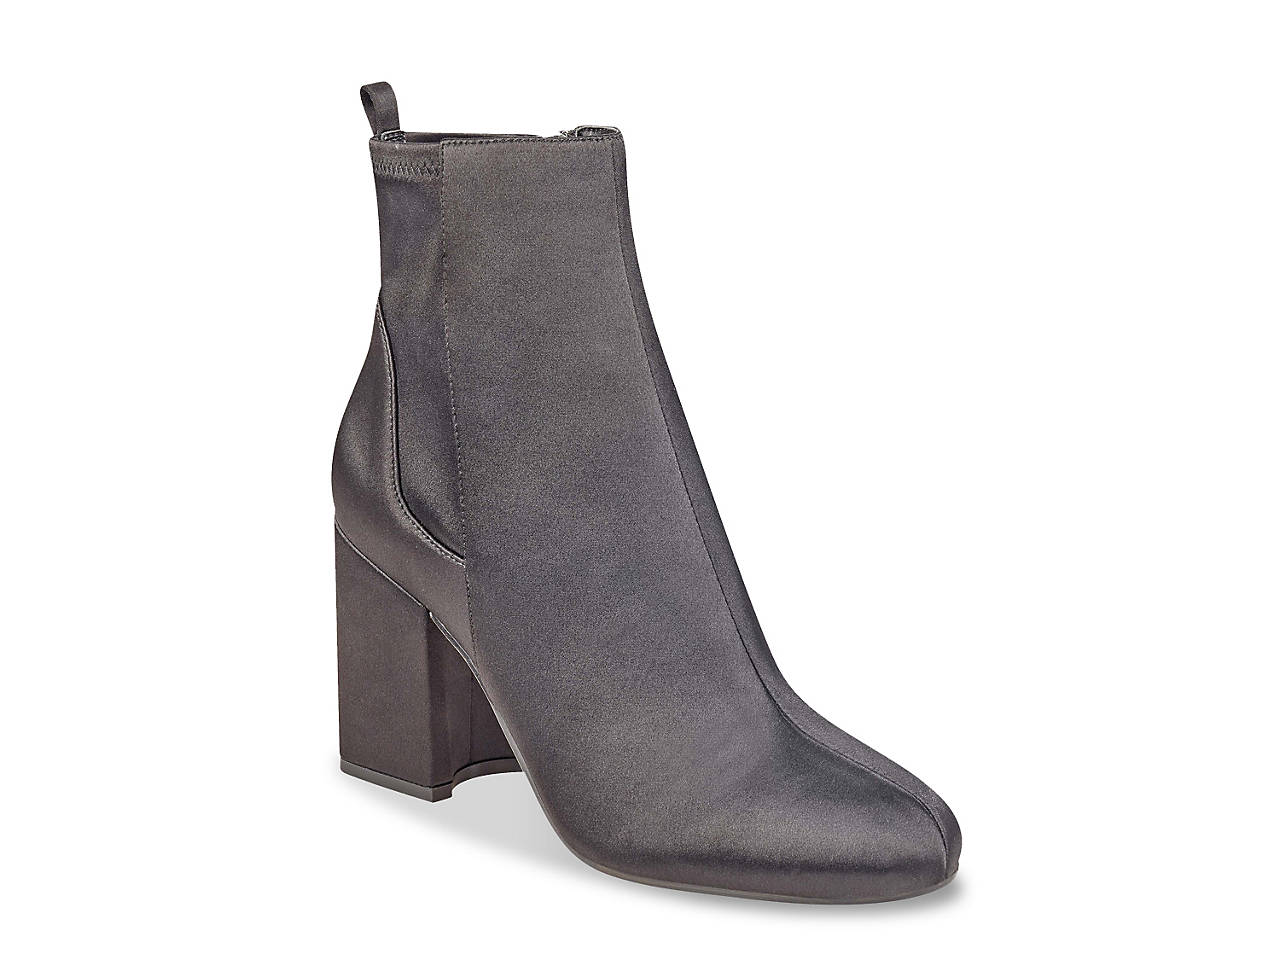 96bd28f35138 Marc Fisher Janie Bootie Women s Shoes